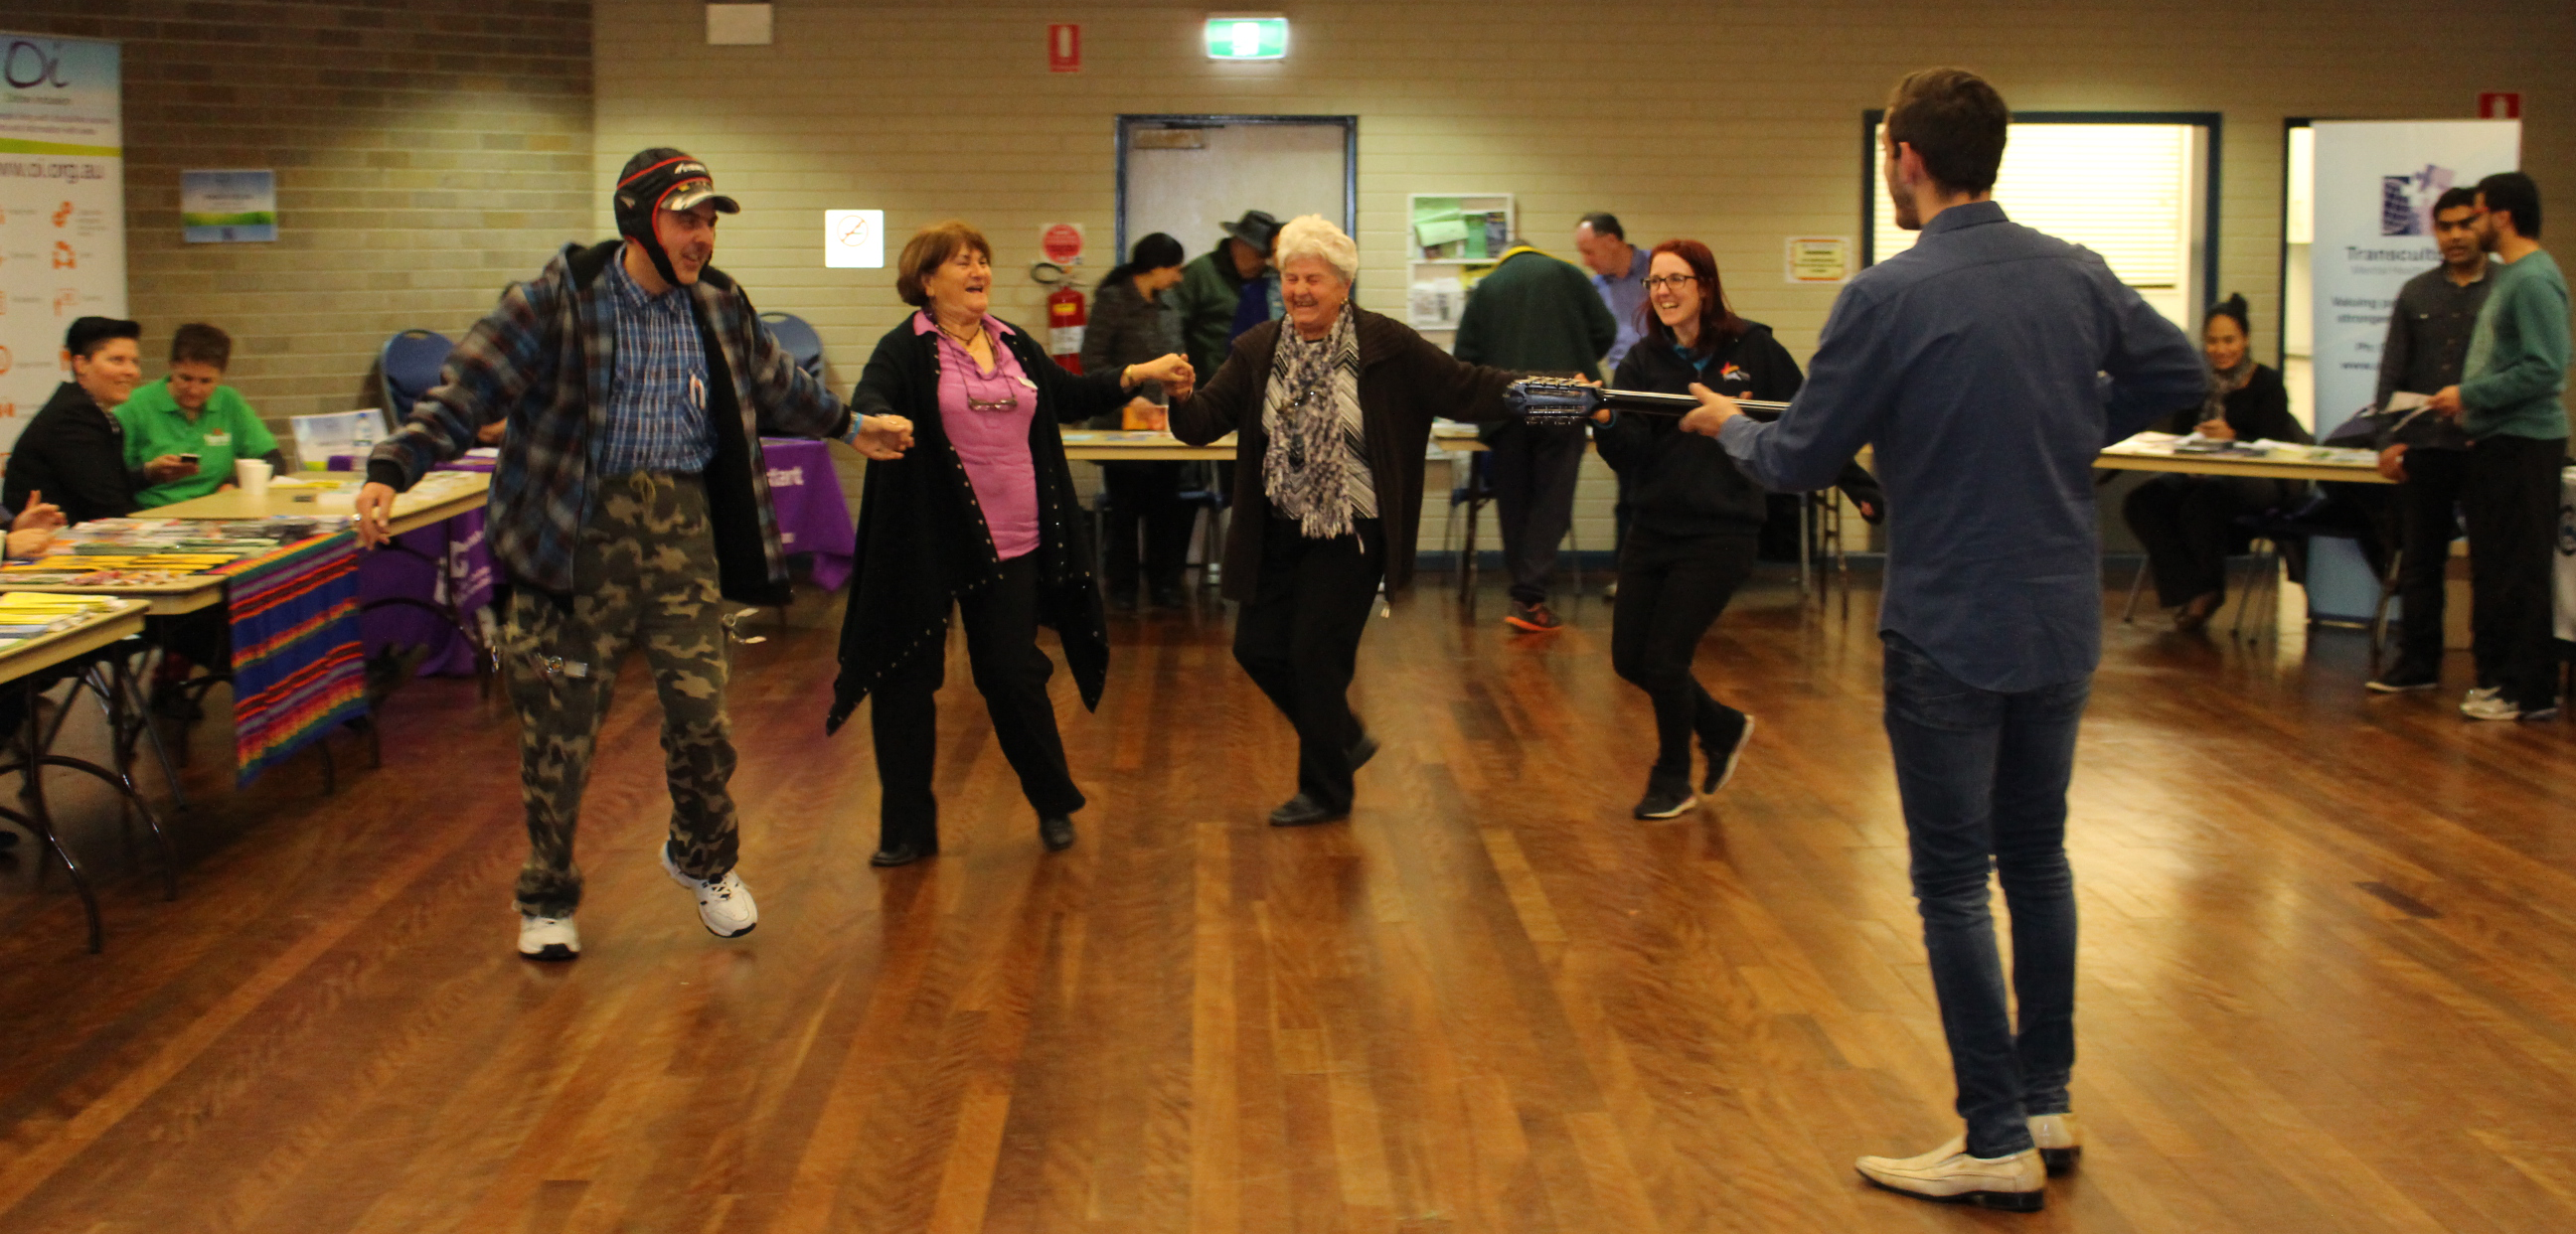 Traditional Greek dancing at Lakemba Senior Citizen's Centre.